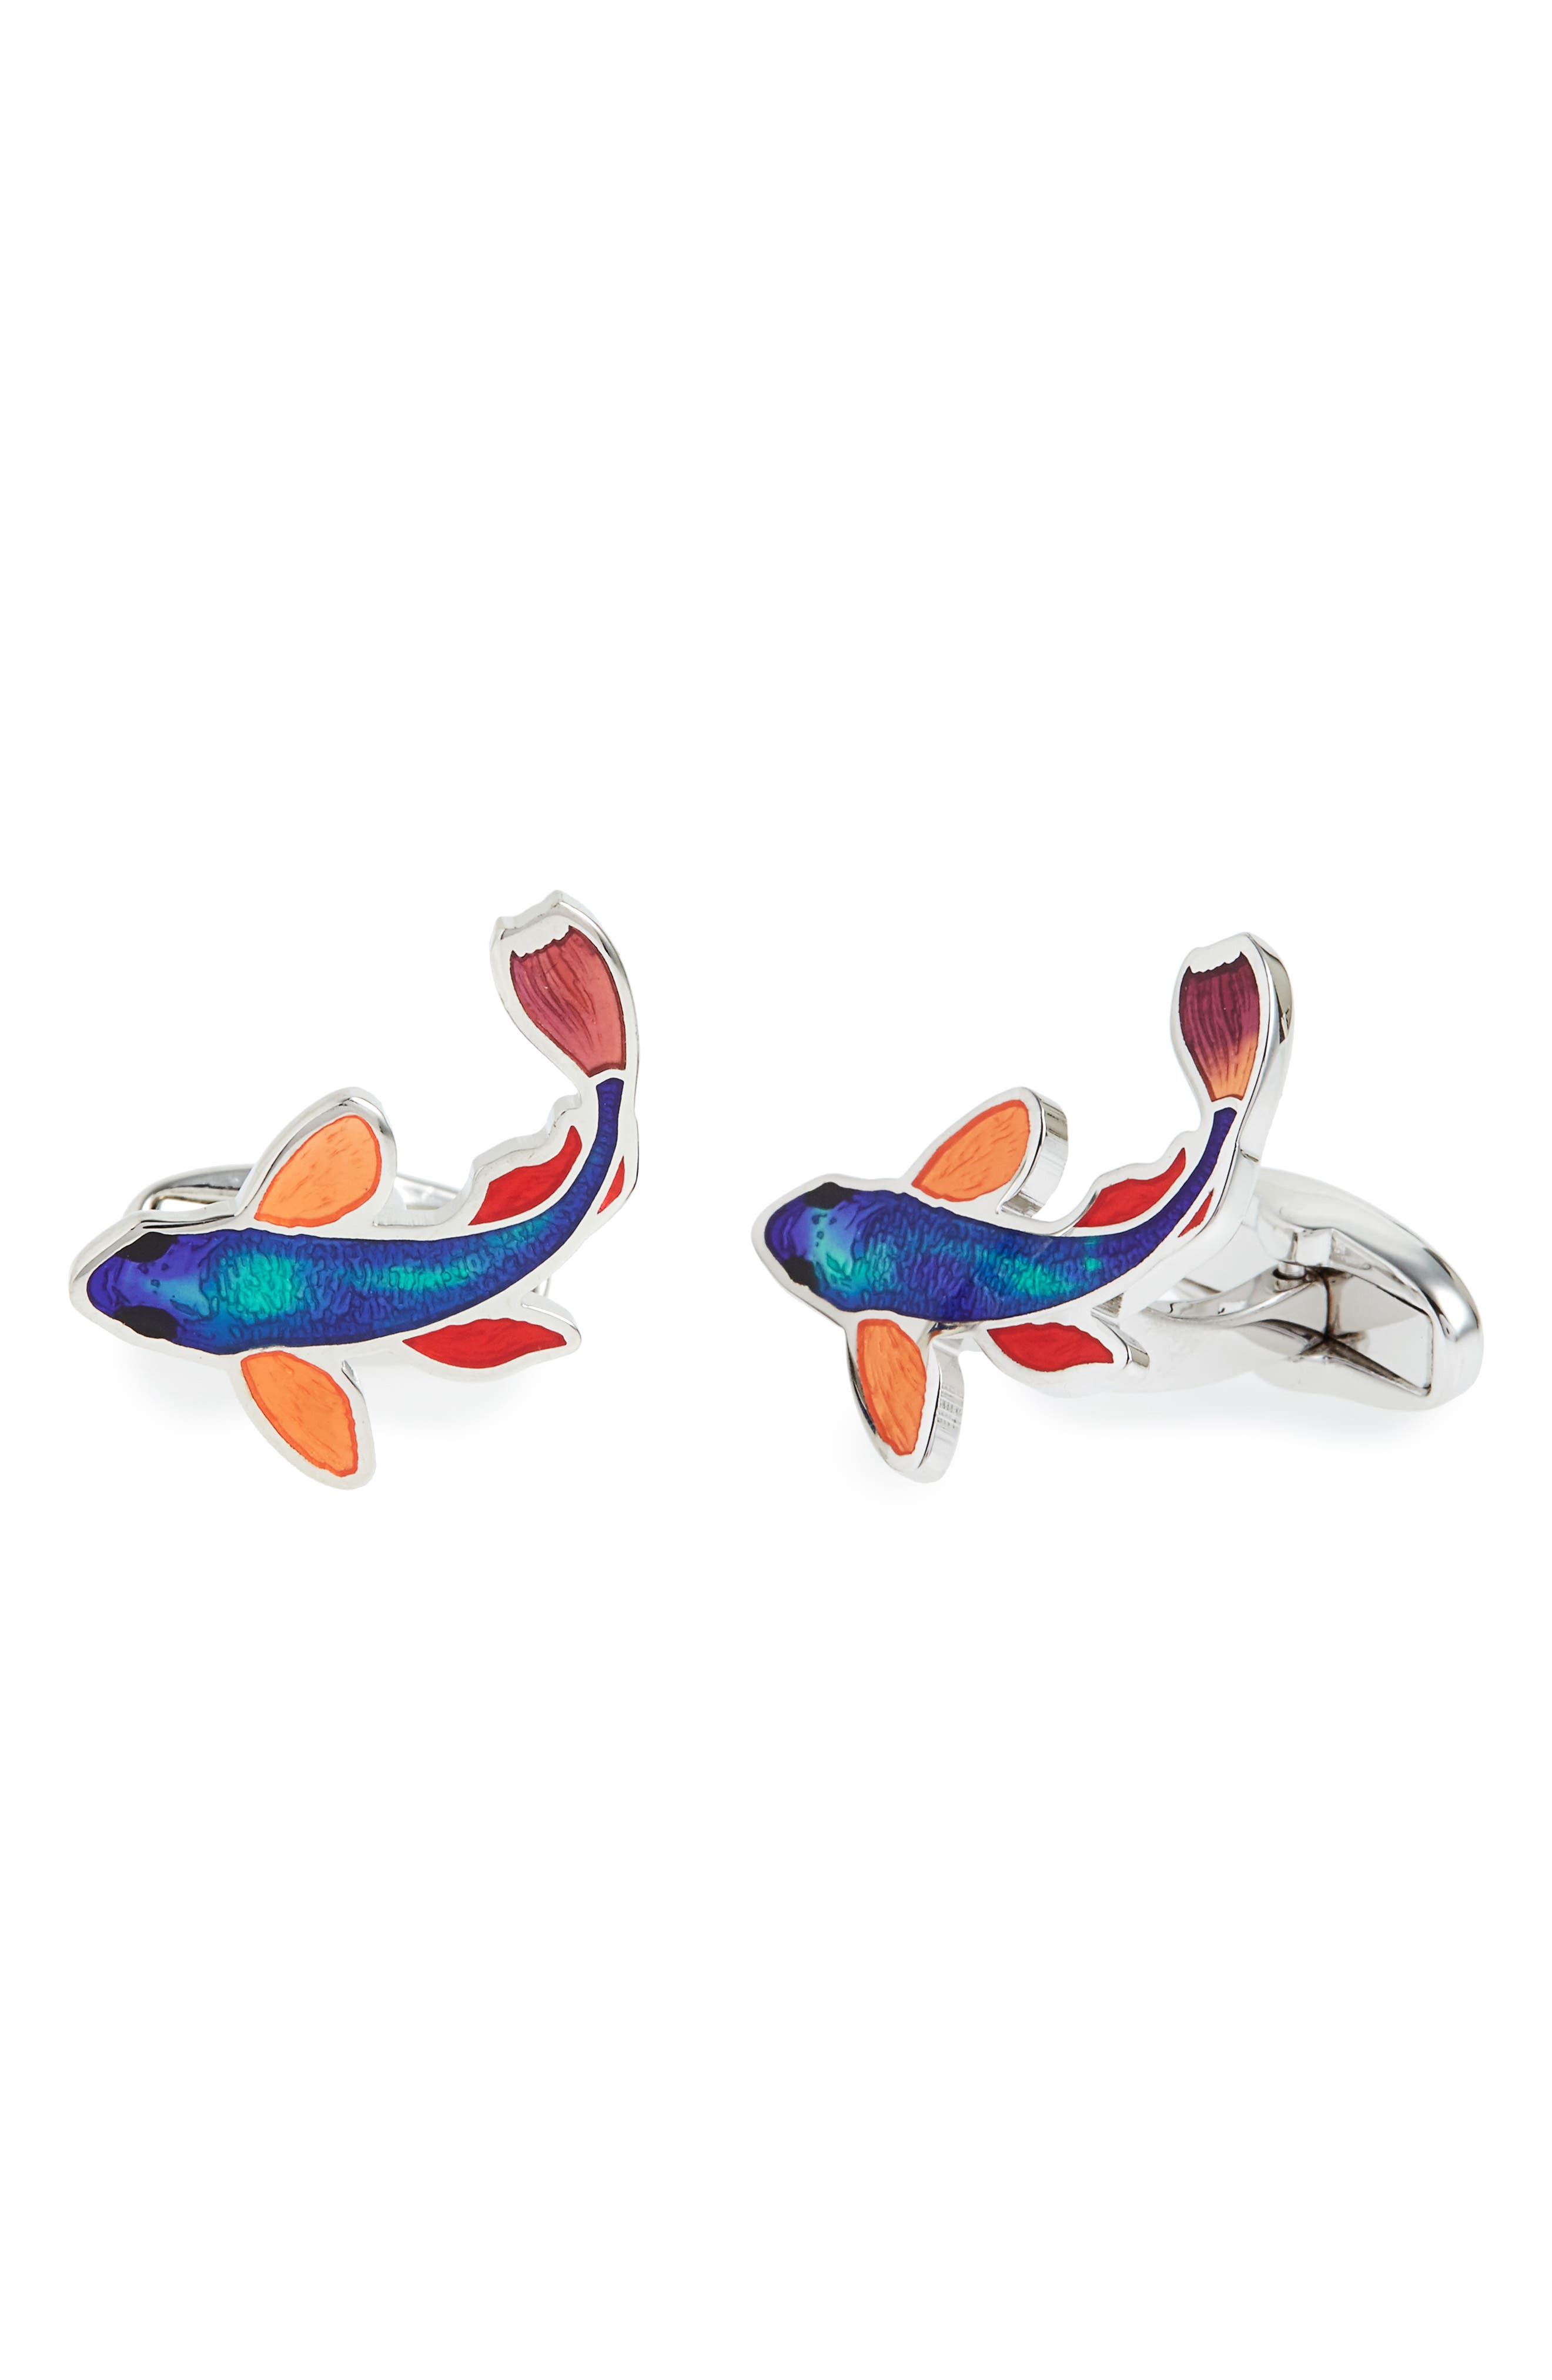 Fish Cuff Links,                         Main,                         color, Light Blue